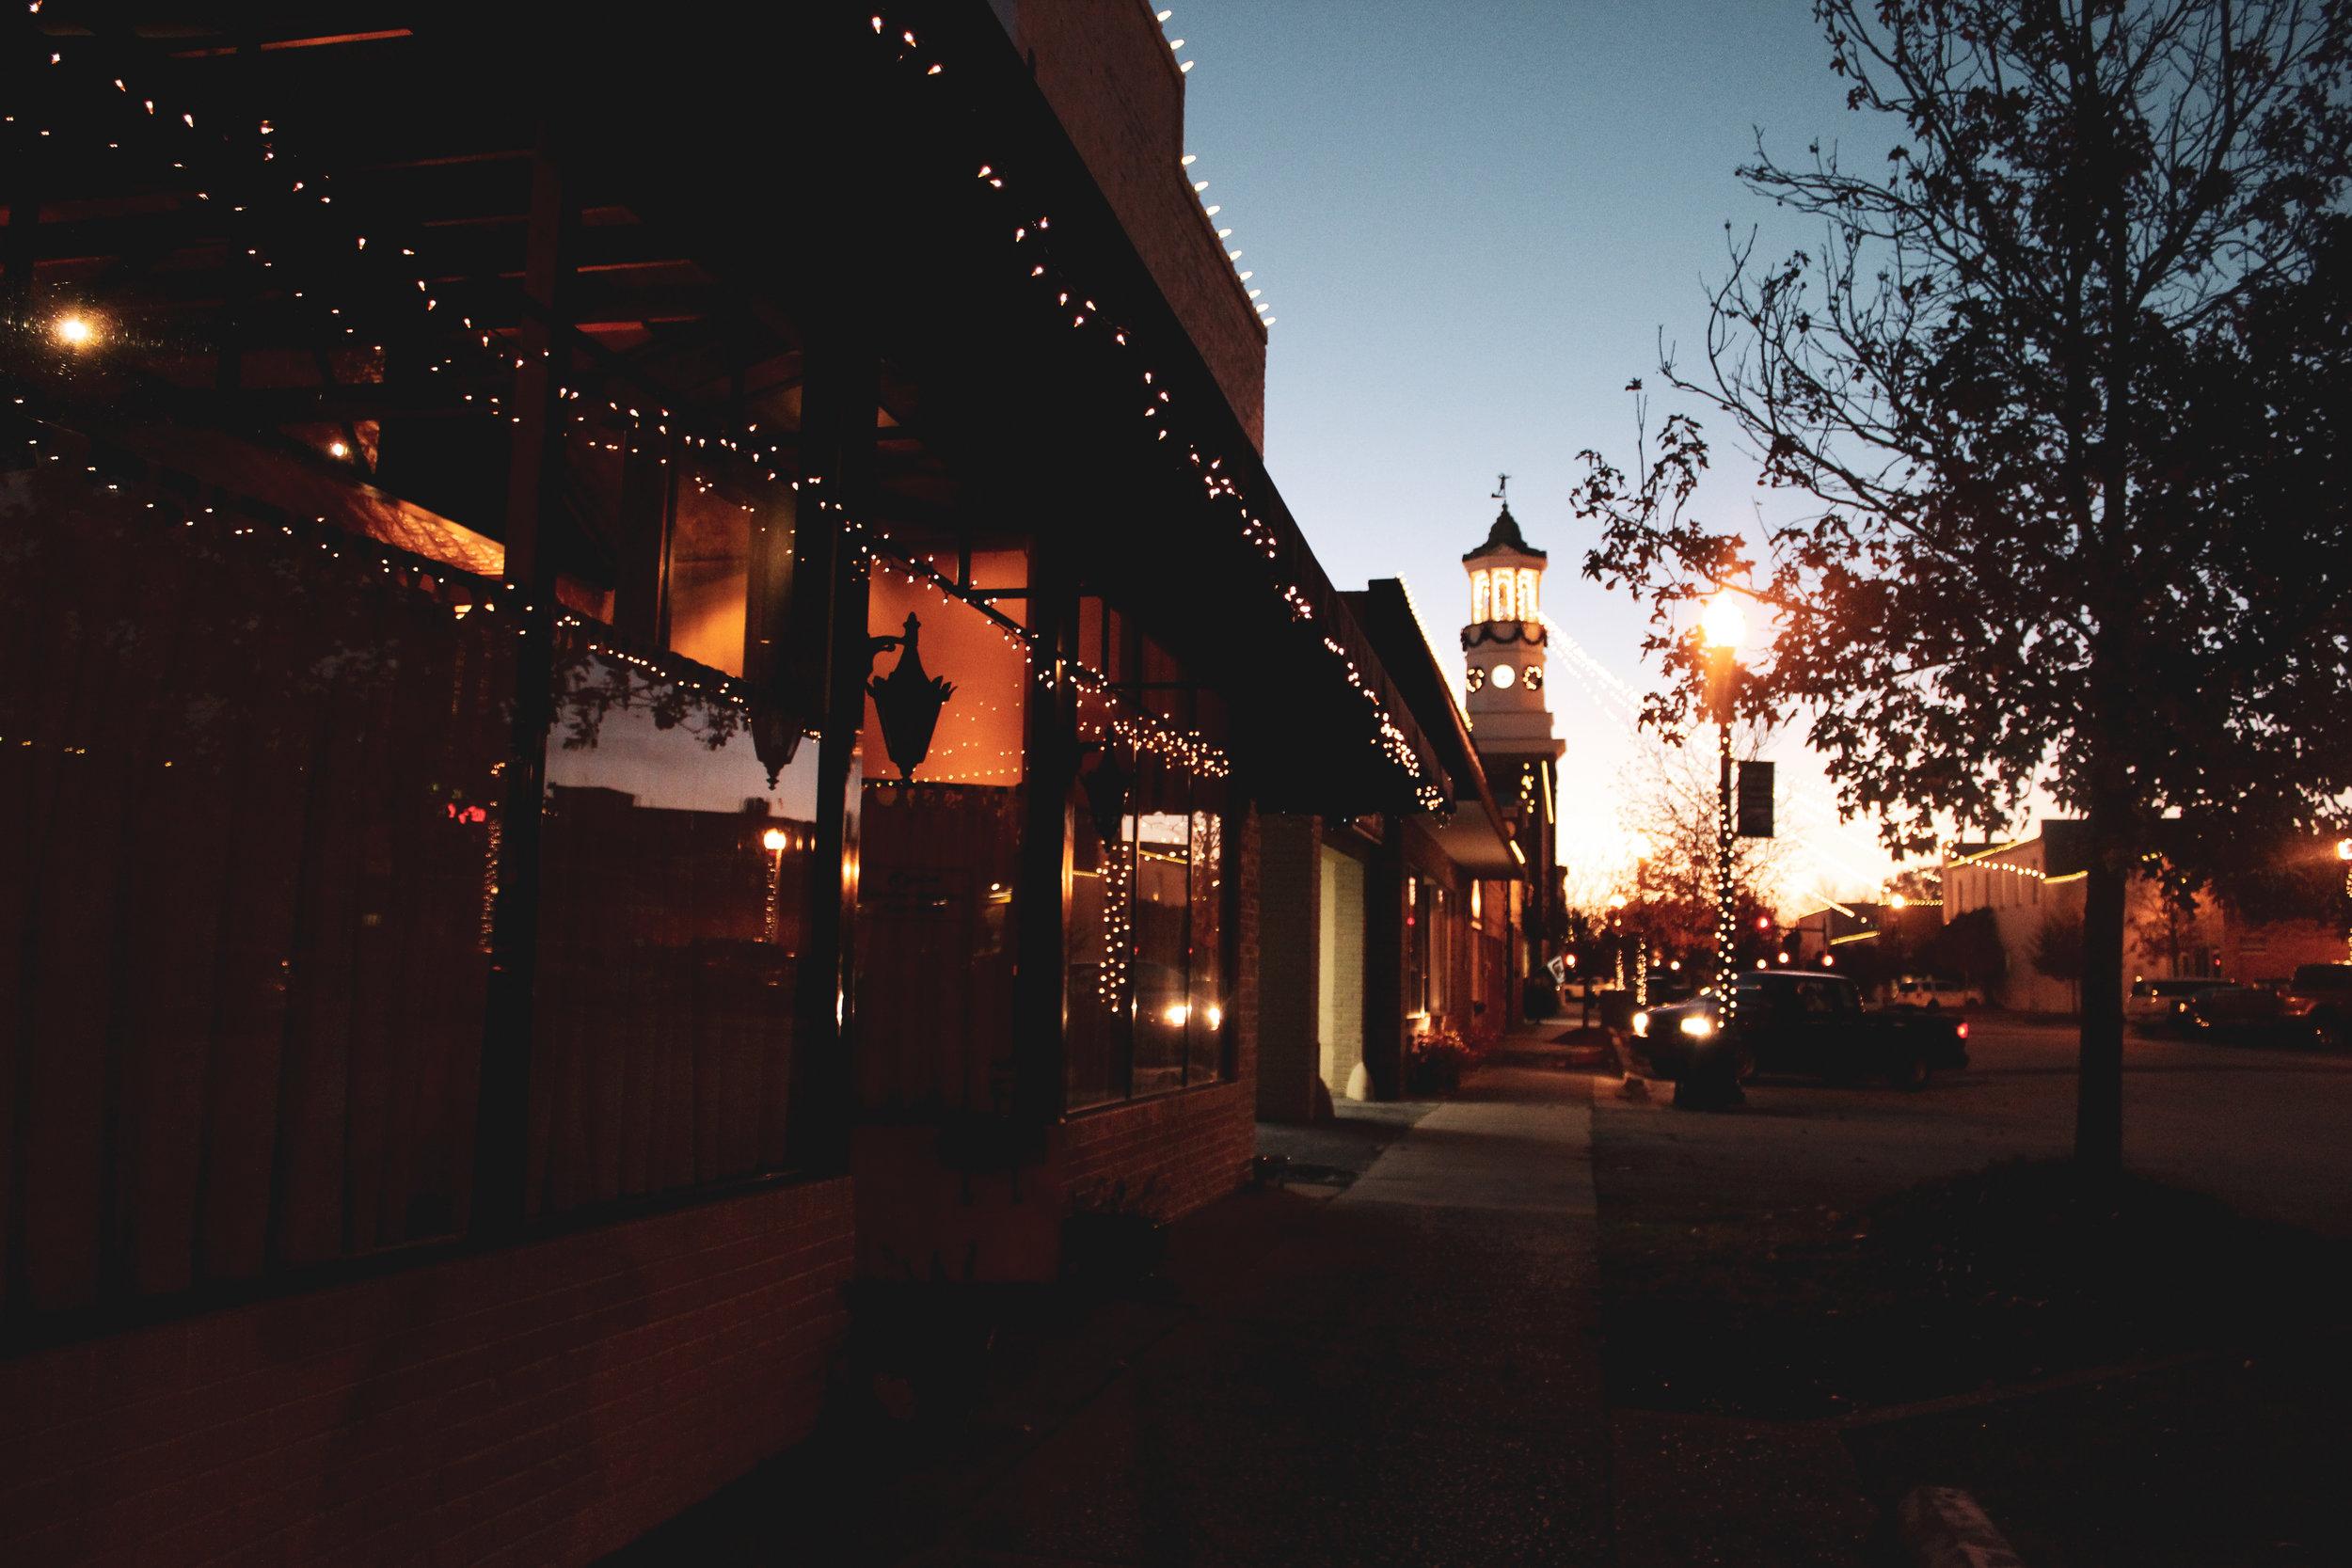 511 Rutledge - Event Venue - Exterior View - Downtown Camden